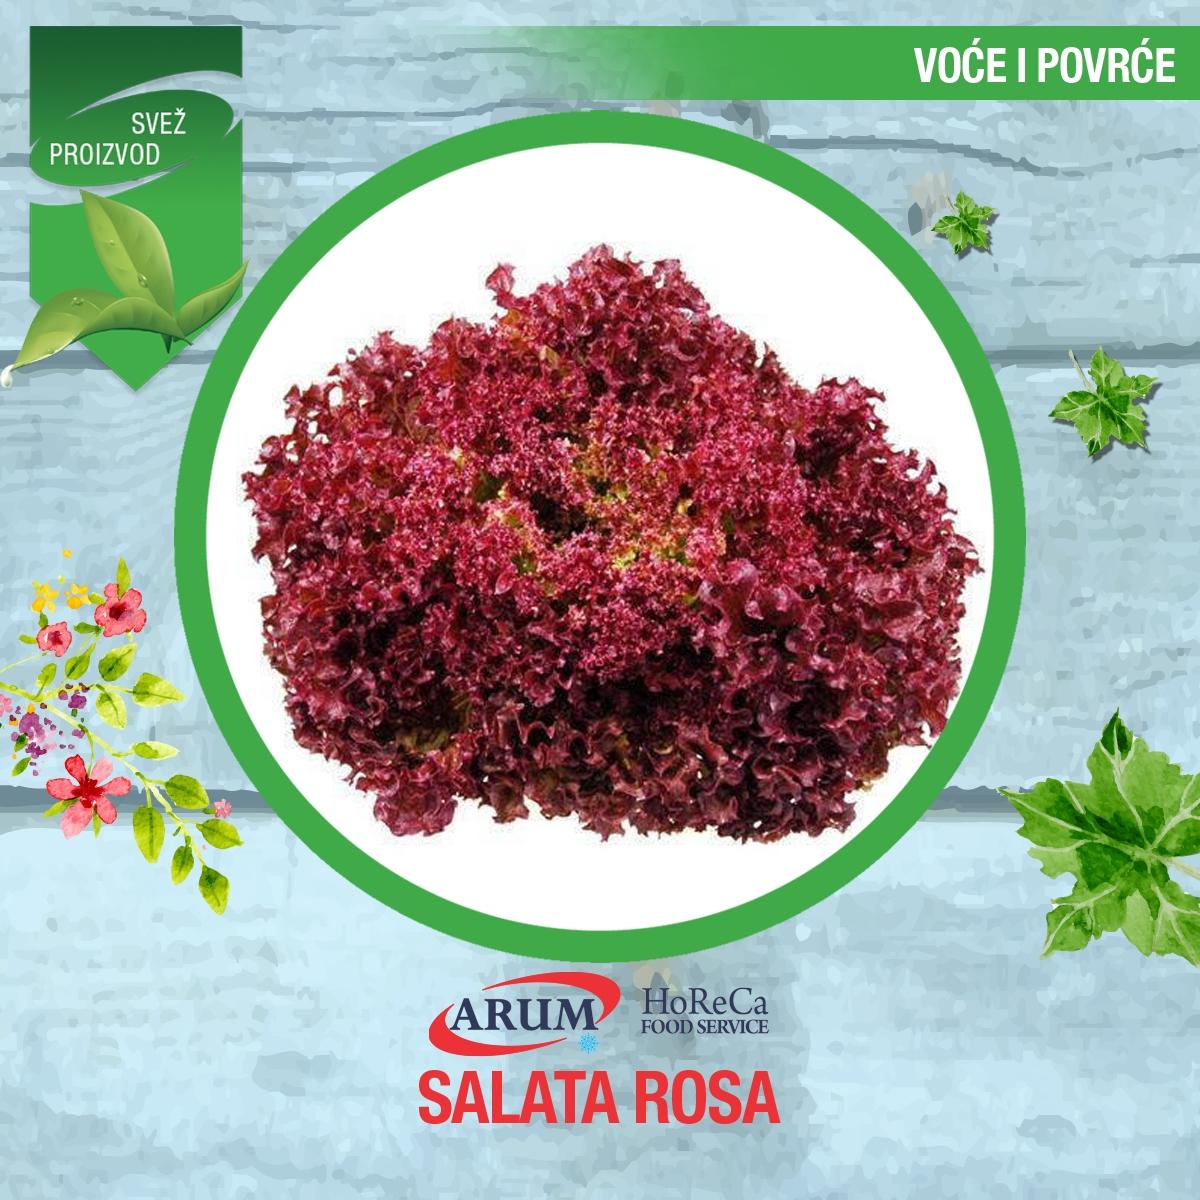 Salata rosa